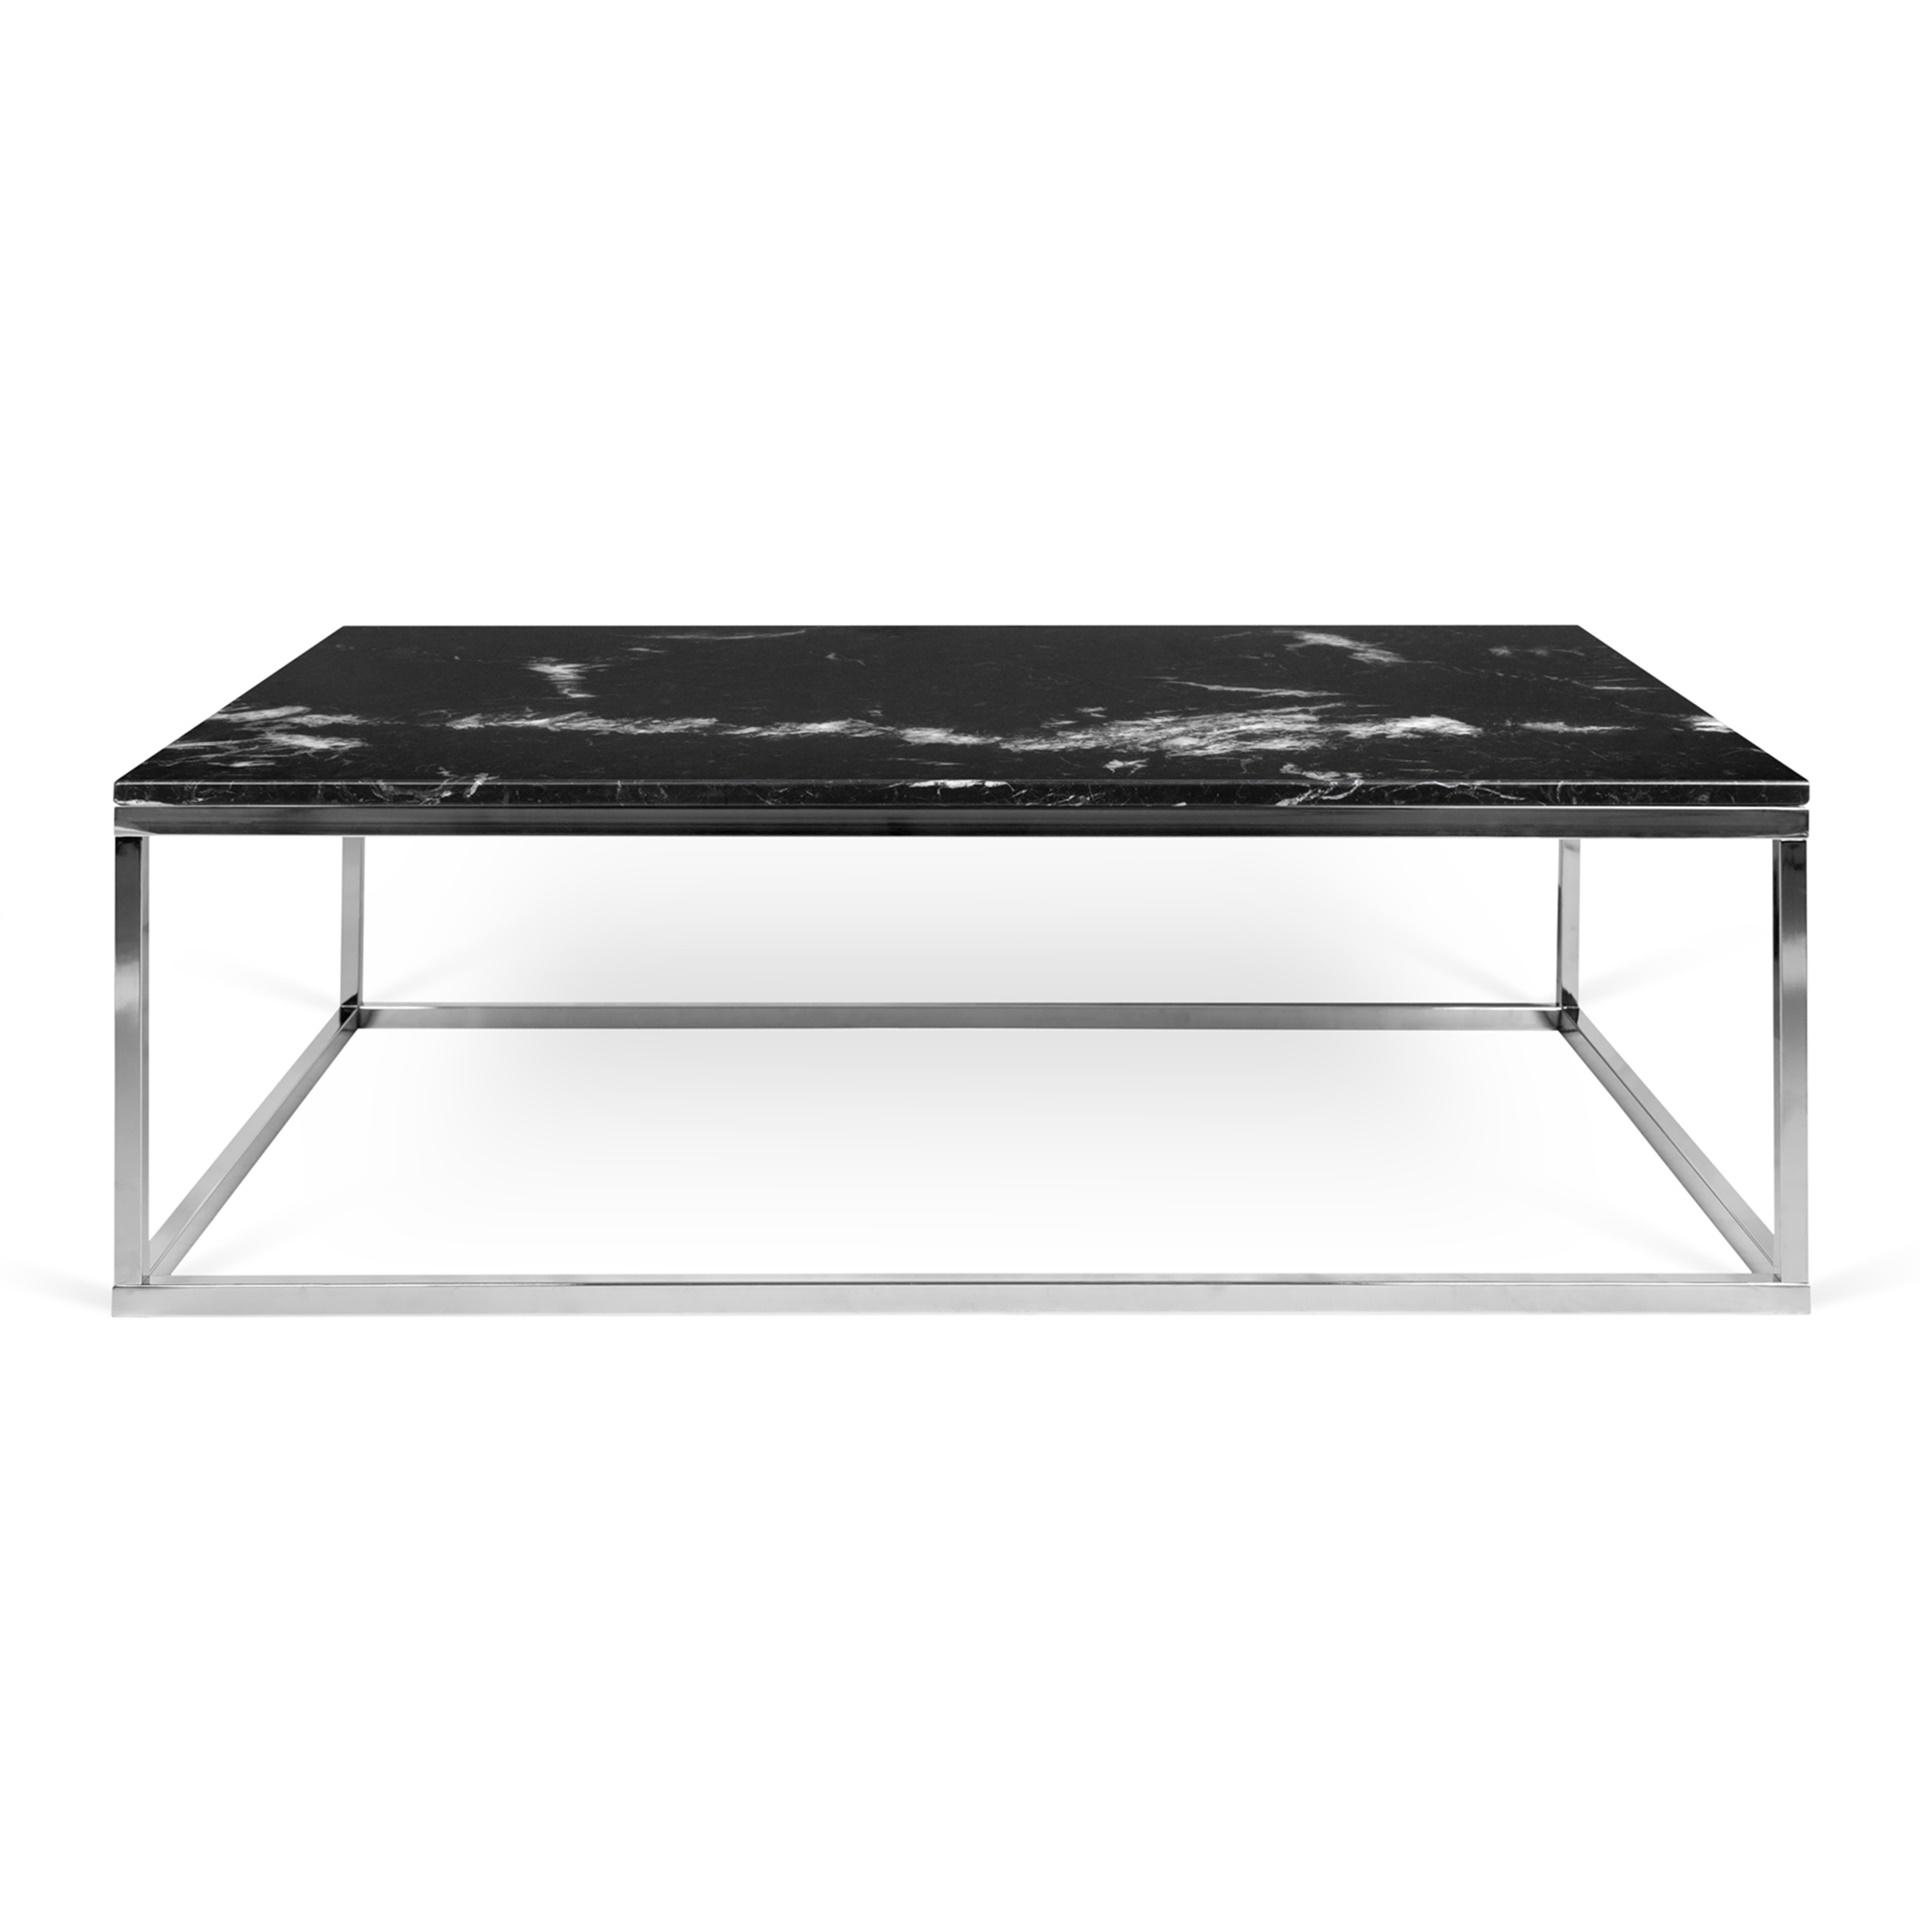 30 X 30 Square Coffee Table.Prairie 47 X 30 Marble Coffee Table